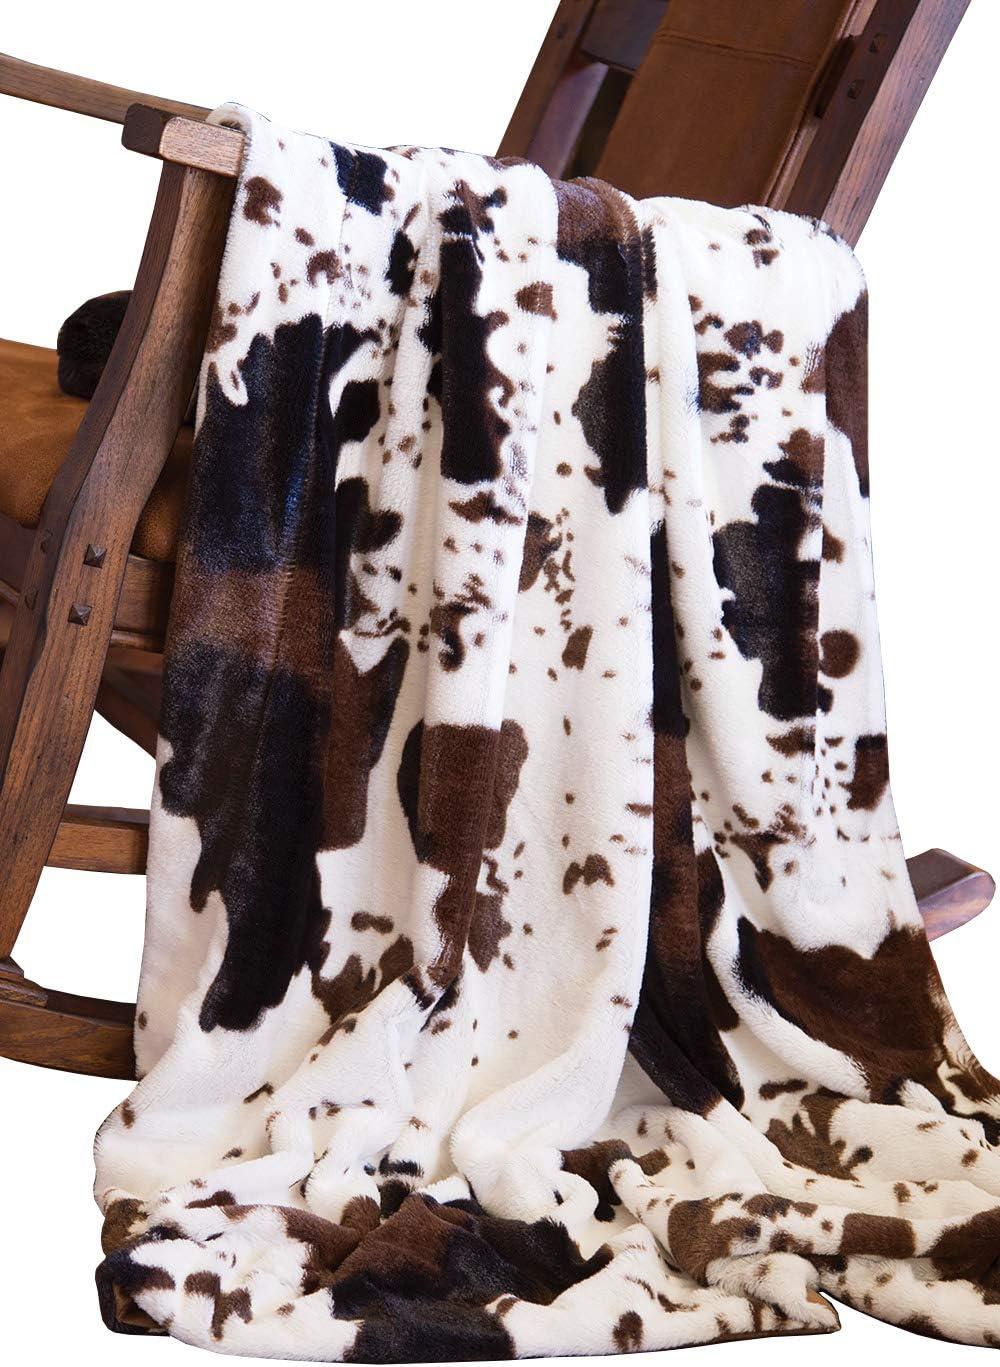 North End Decor Faux Fur Cowhide overseas Blankets Plush Lar unisex 50x60 Throw